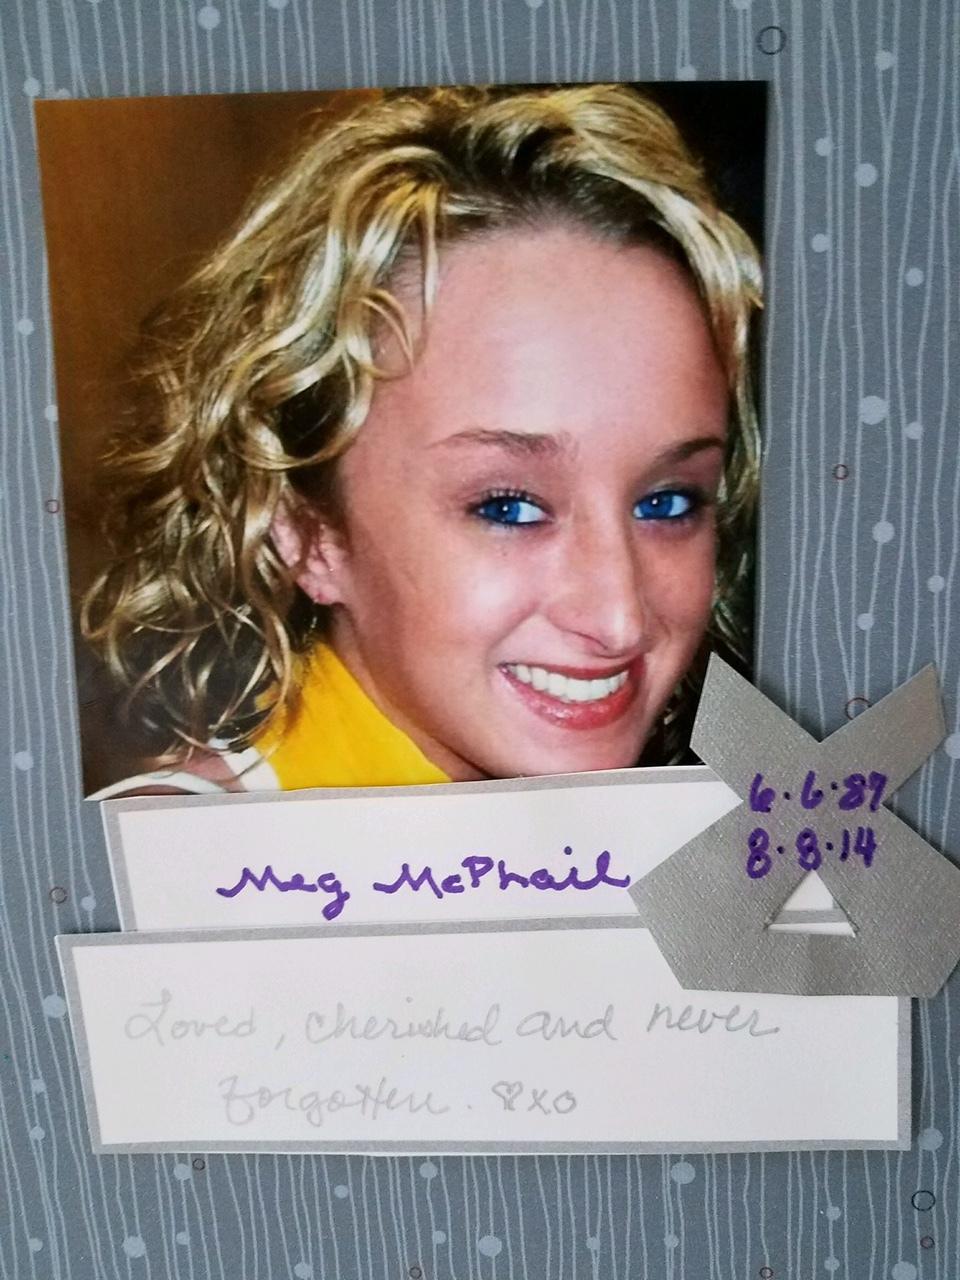 Meg McPhail